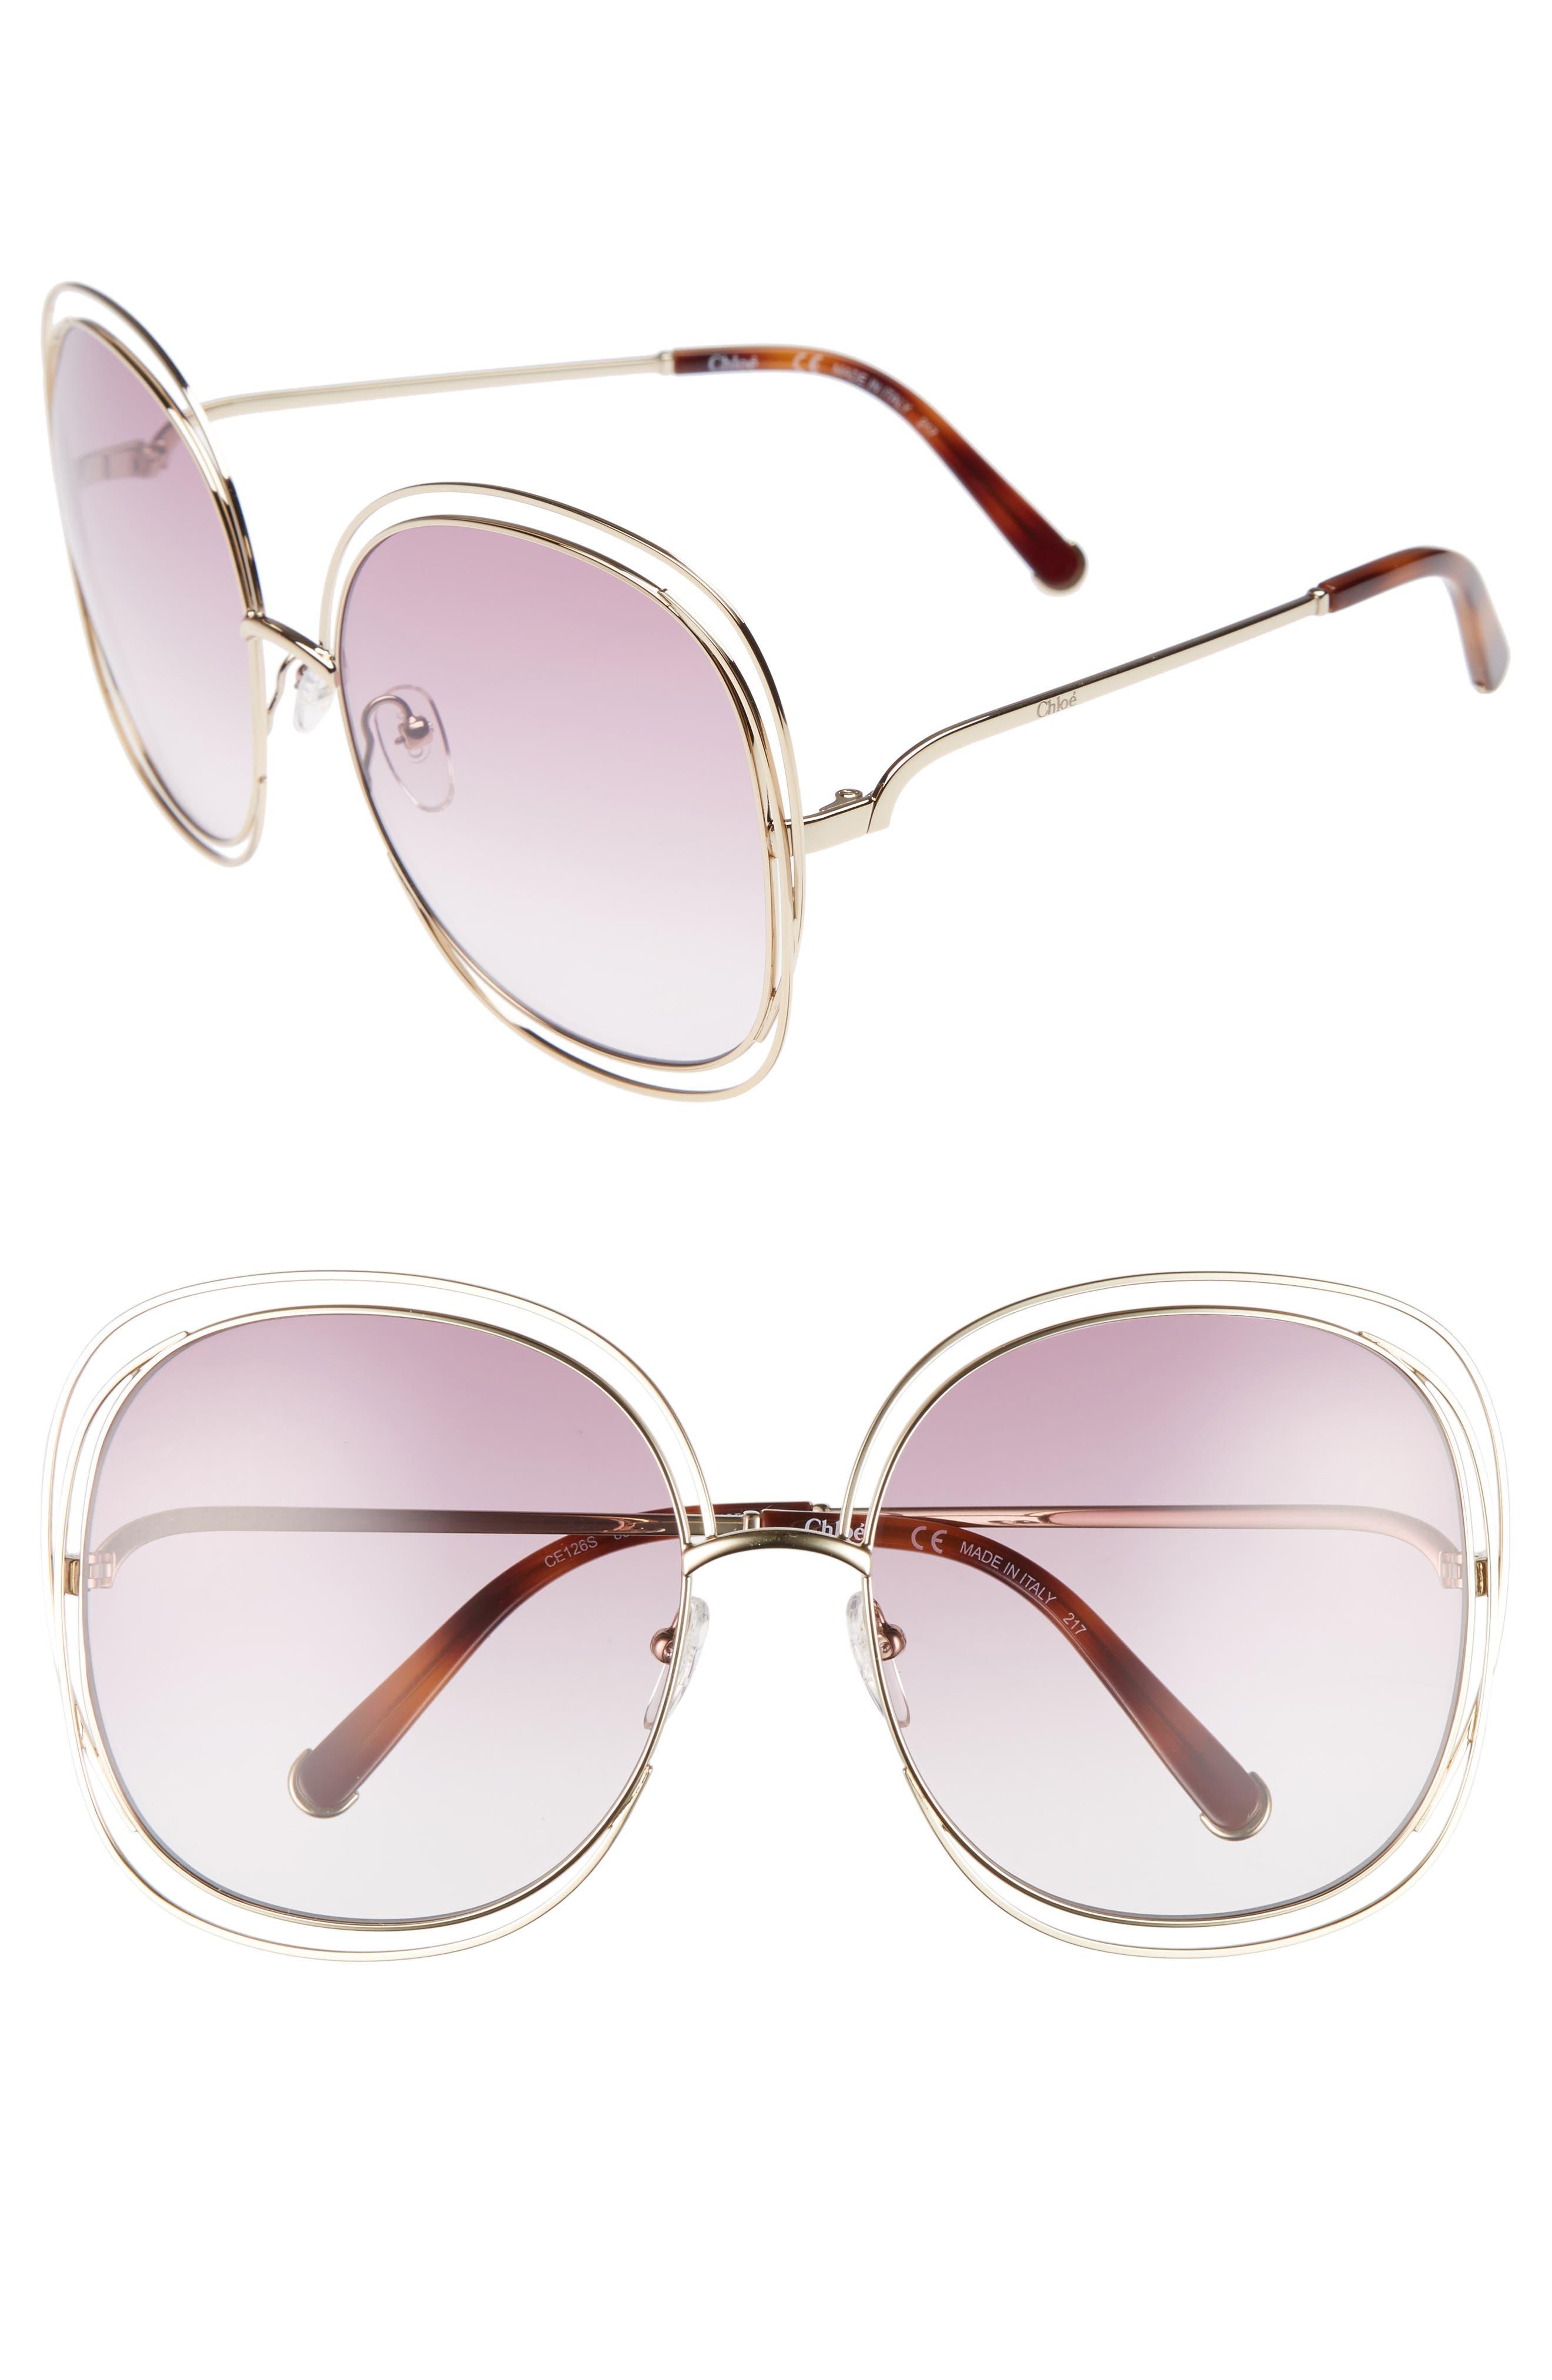 Image of Chloe Carlina 62mm Square Sunglasses